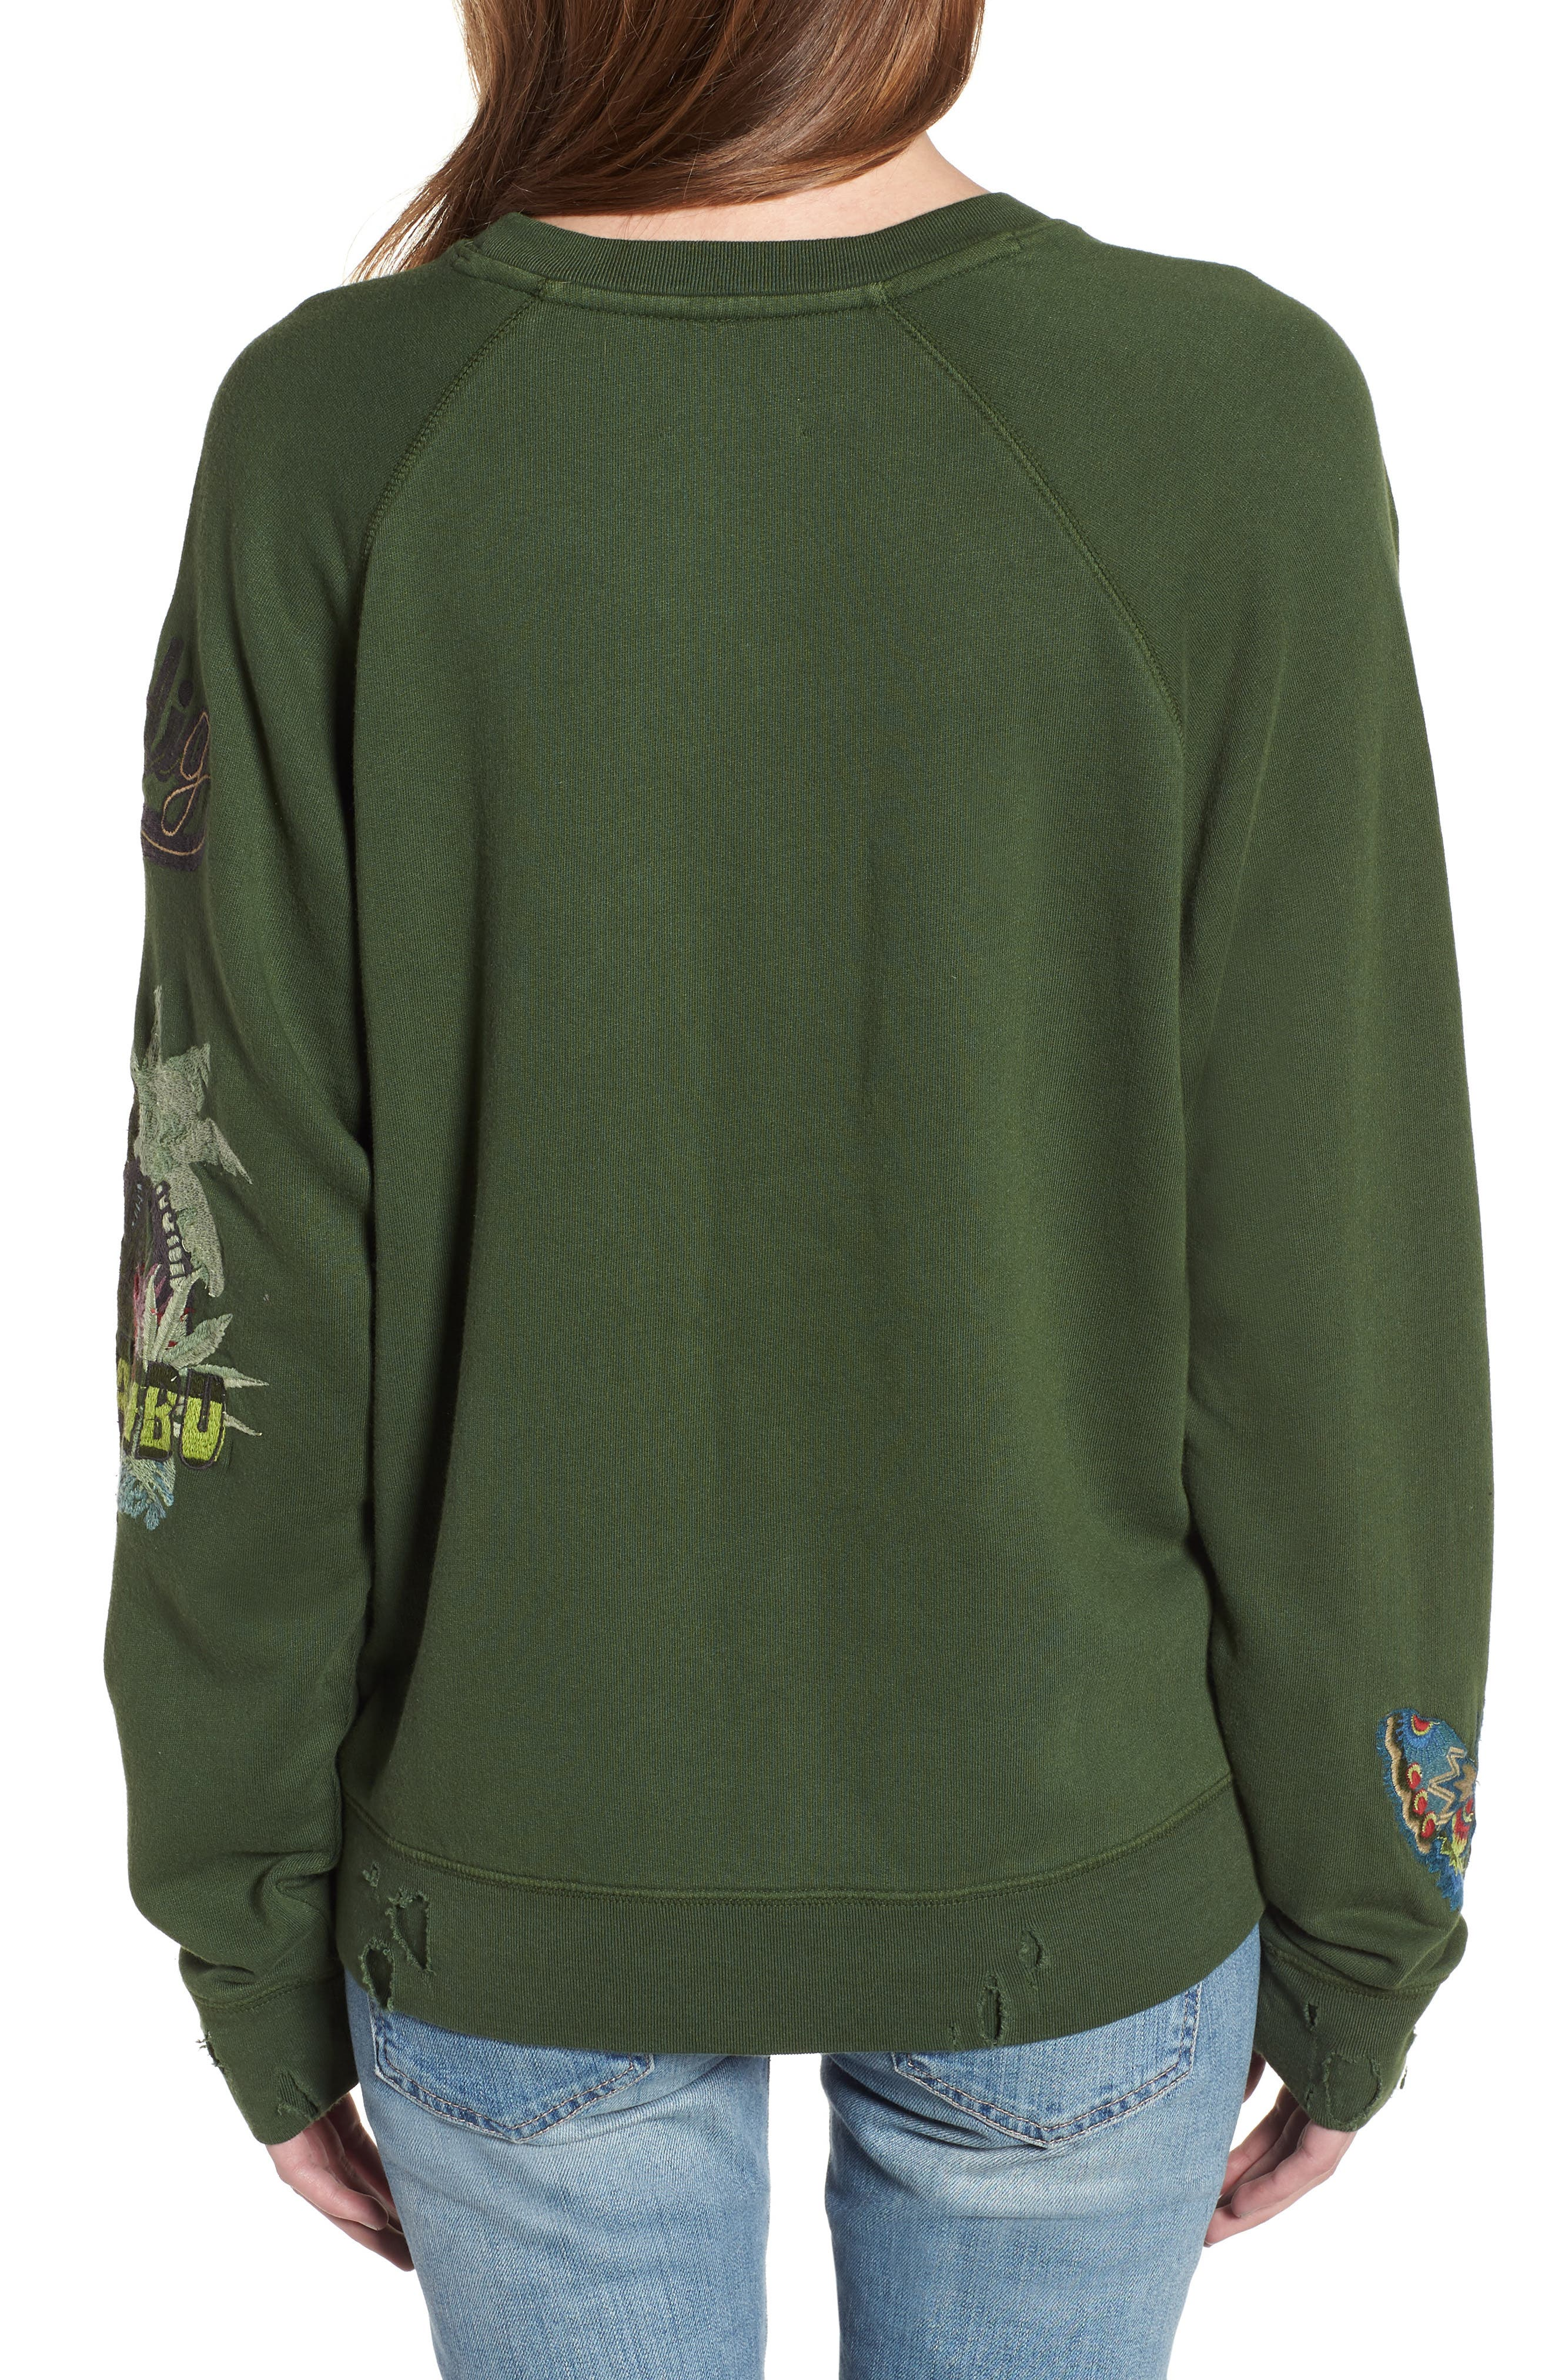 Upper Bis Brode Sweatshirt,                             Alternate thumbnail 2, color,                             Tropical